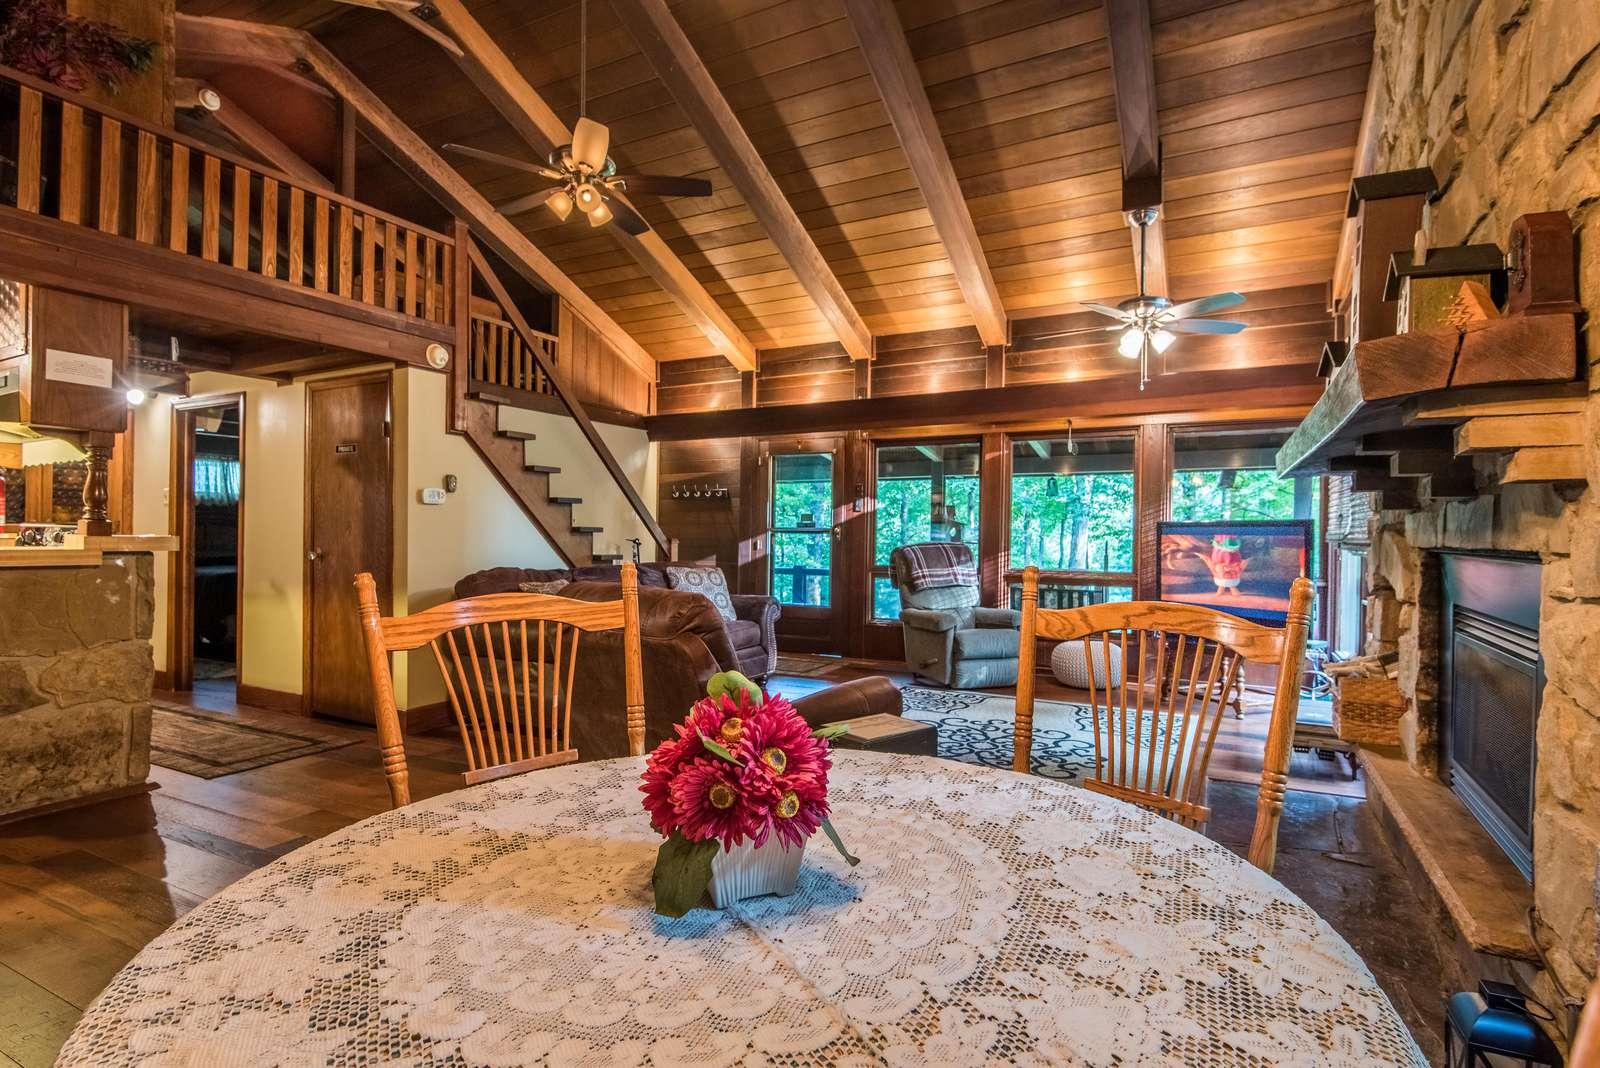 Redwood Log Cabin – Brown County Log Cabins